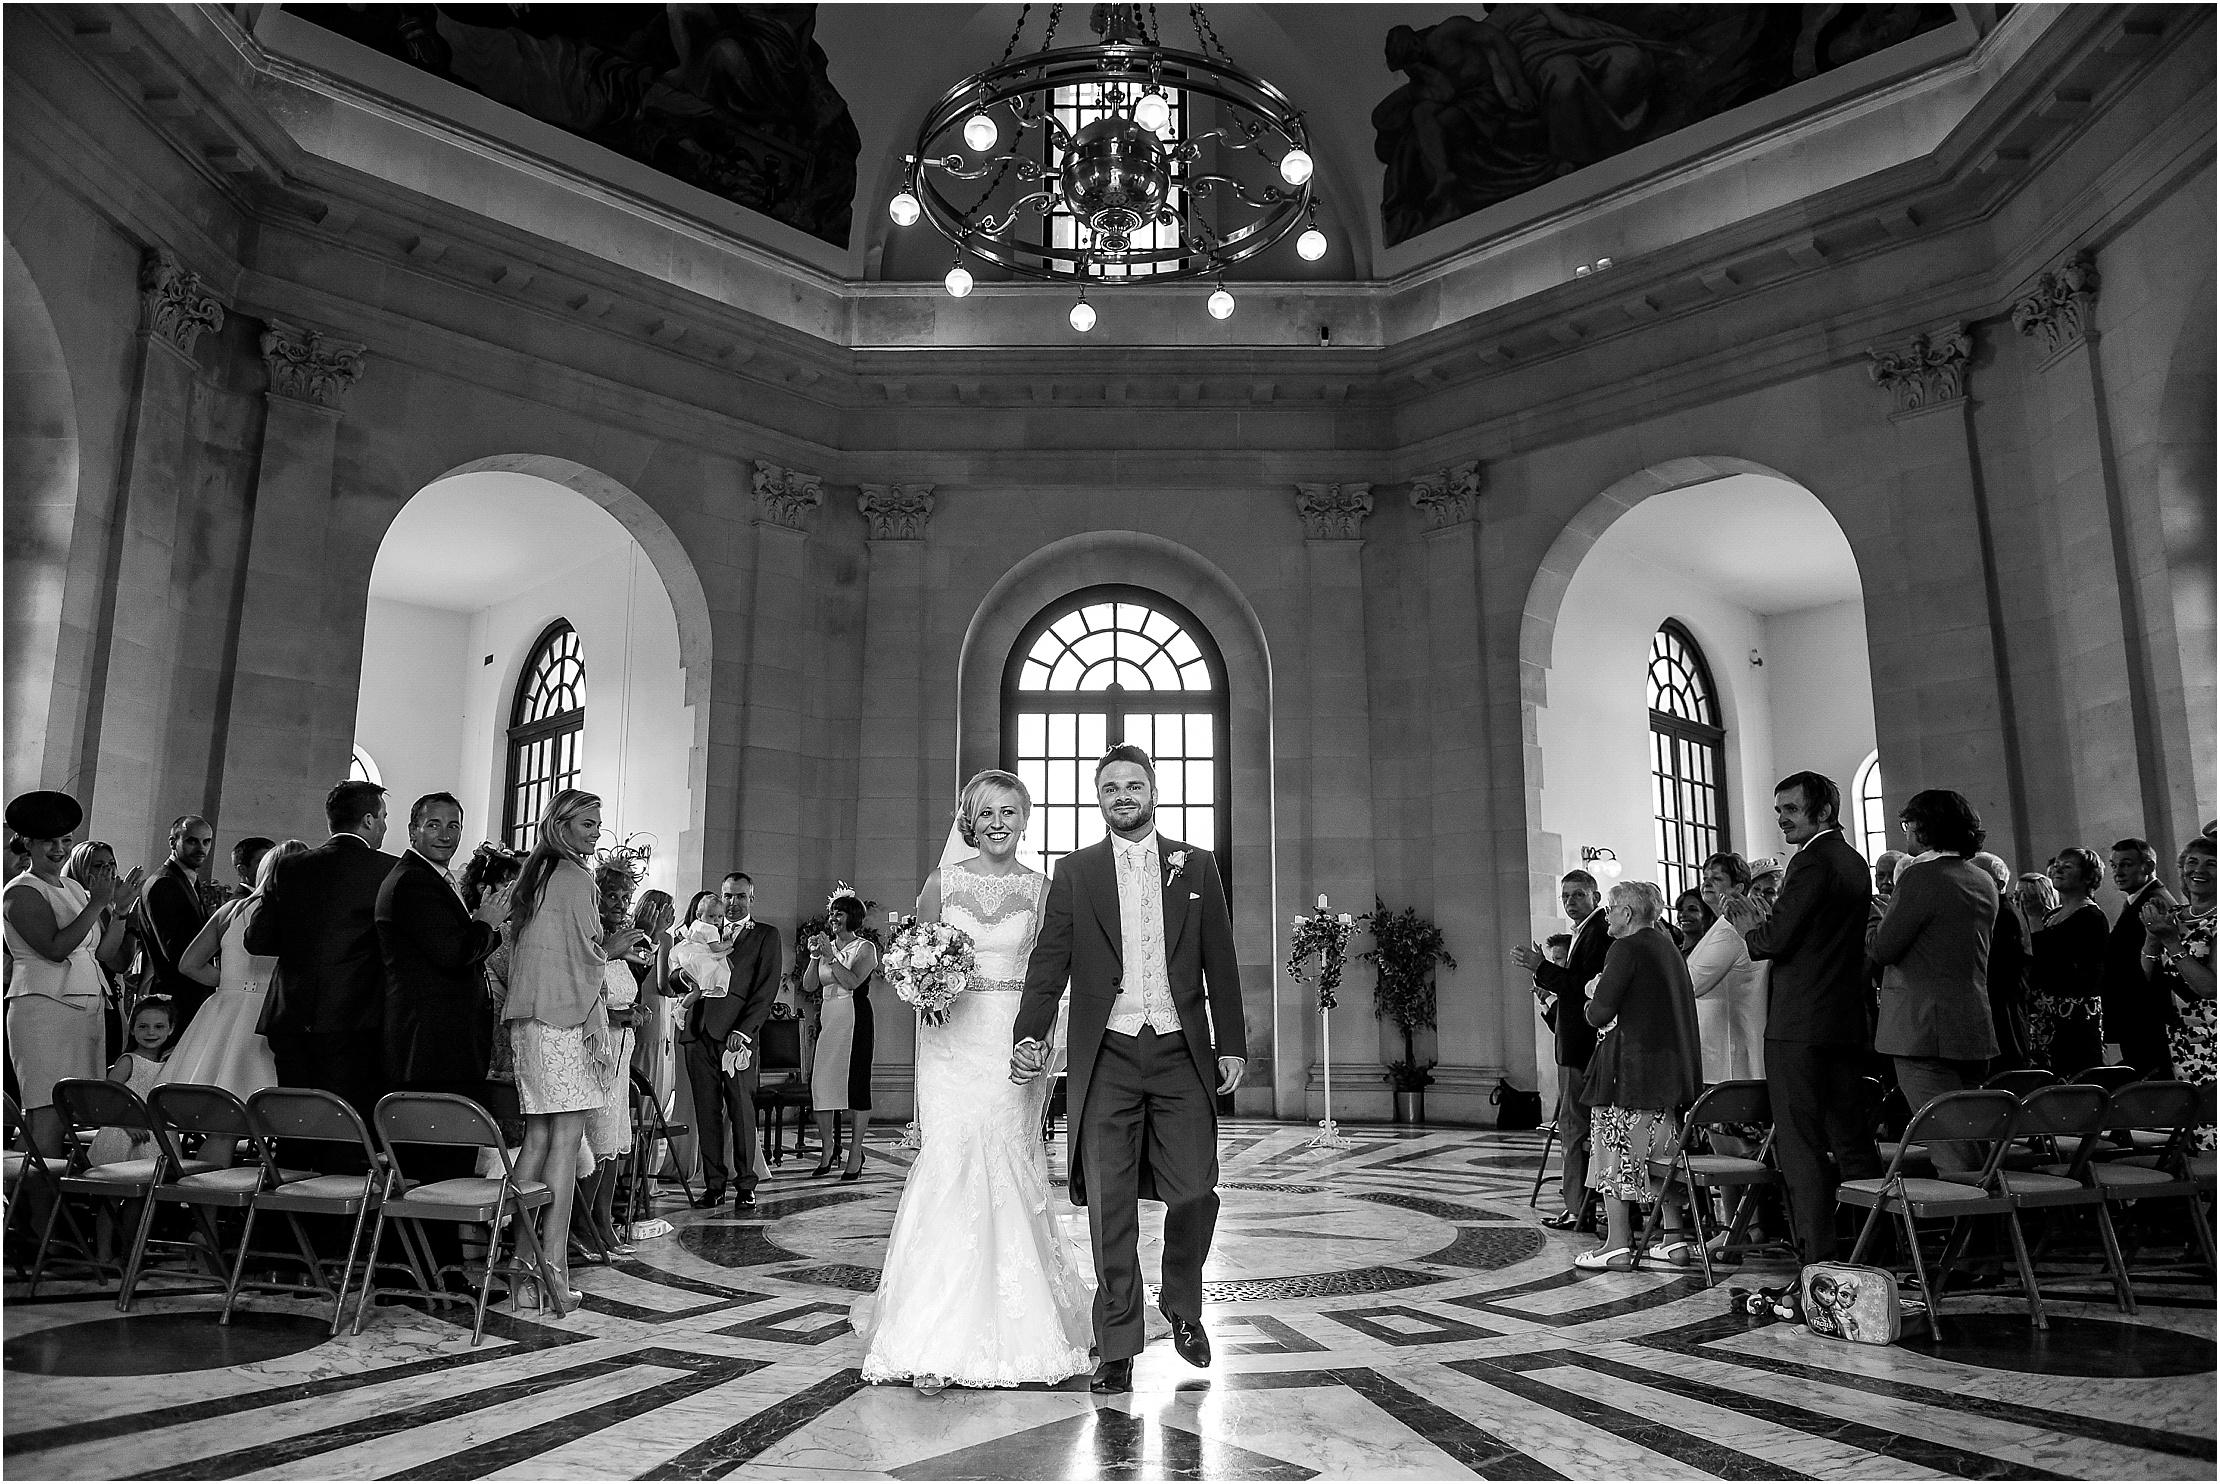 staining-lodge-wedding-073.jpg